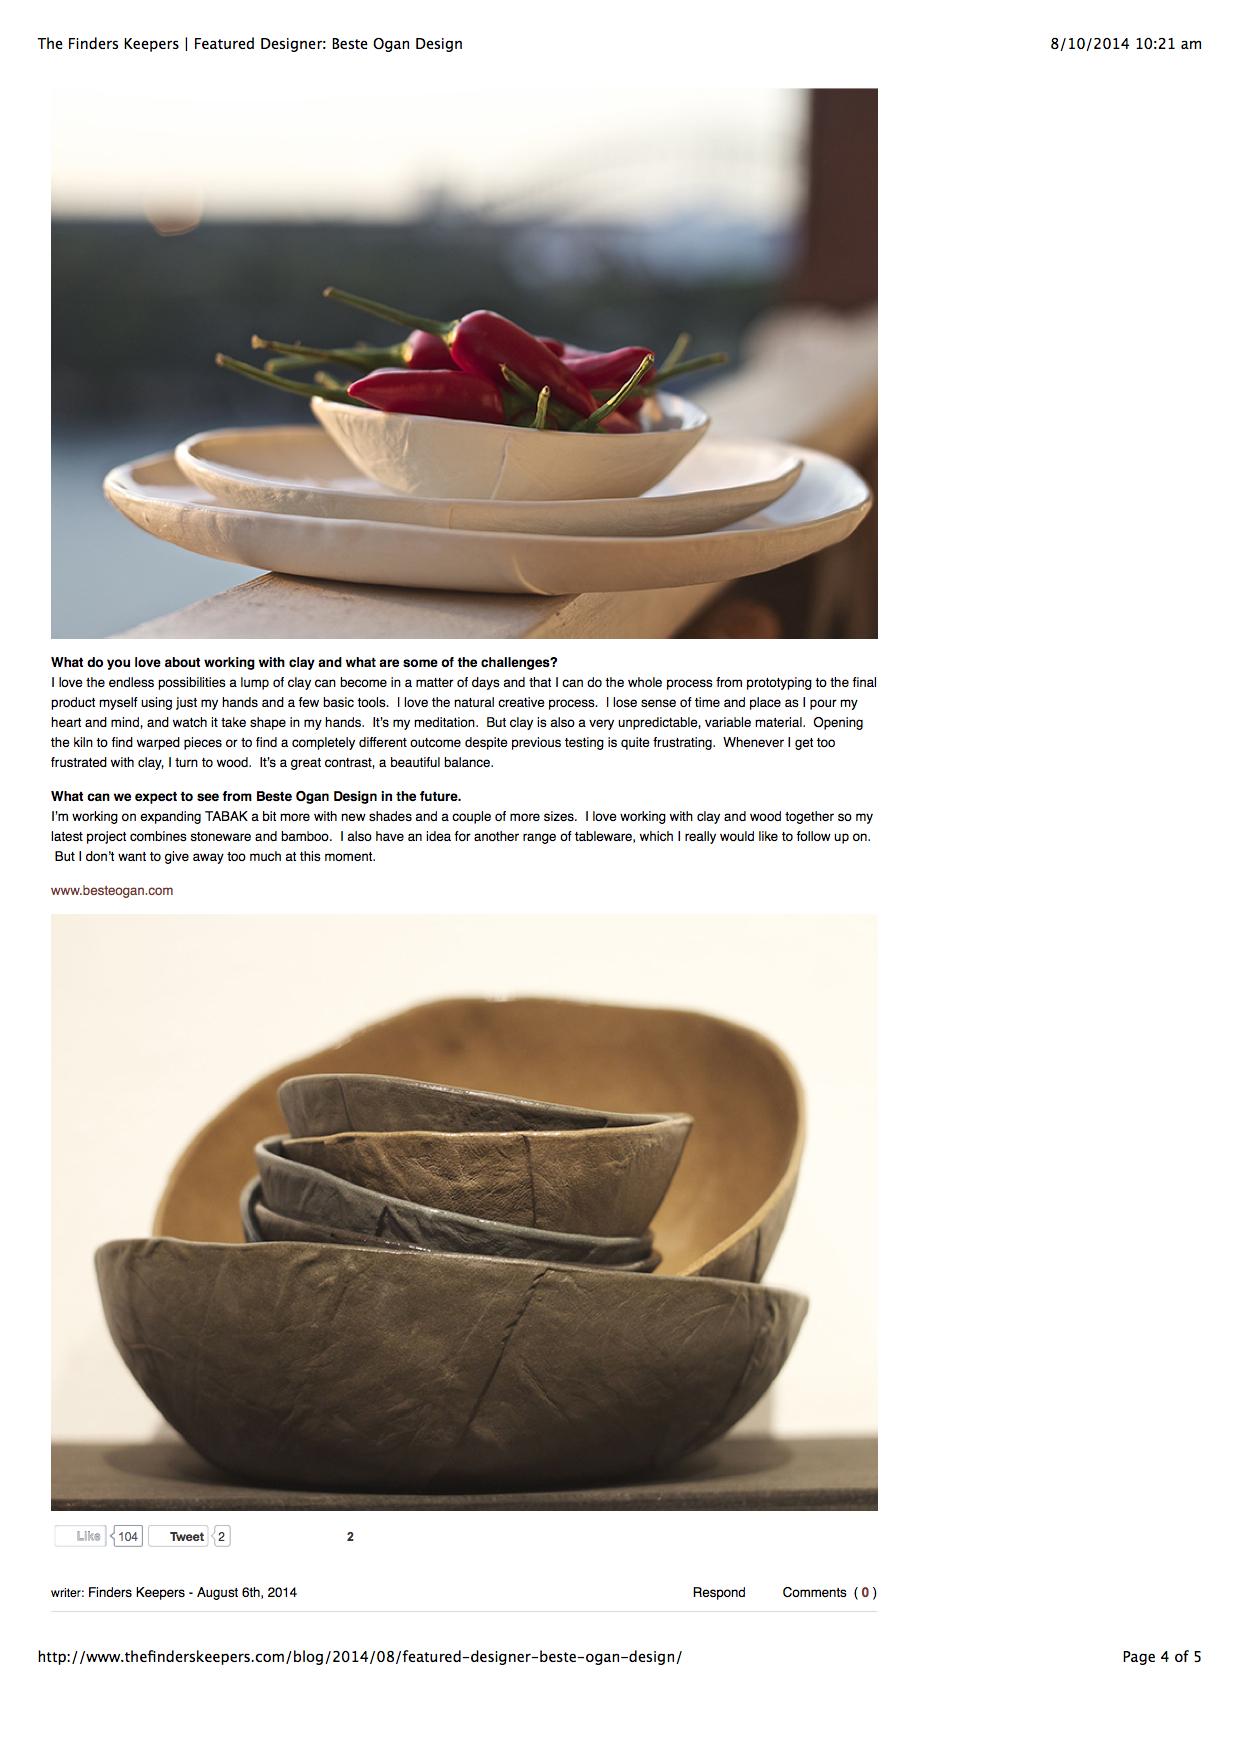 The Finders Keepers | Featured Designer: Beste Ogan Design4.jpg